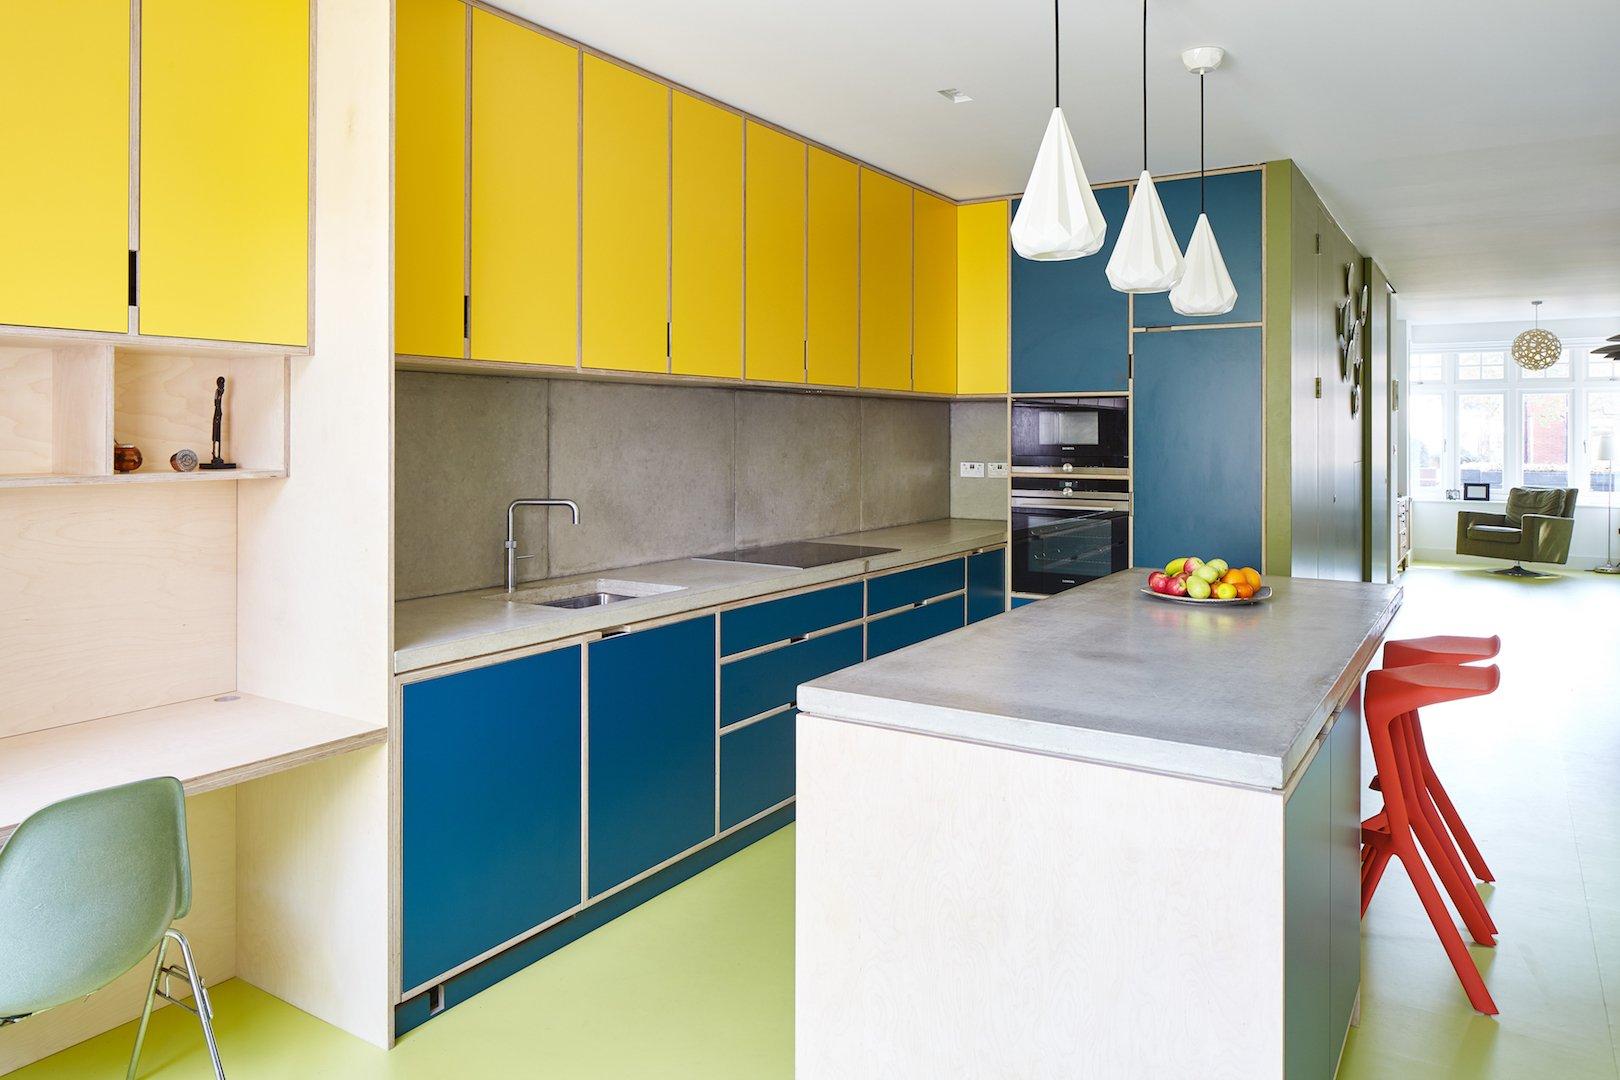 Kennington House kitchen by R2 Studio Architects